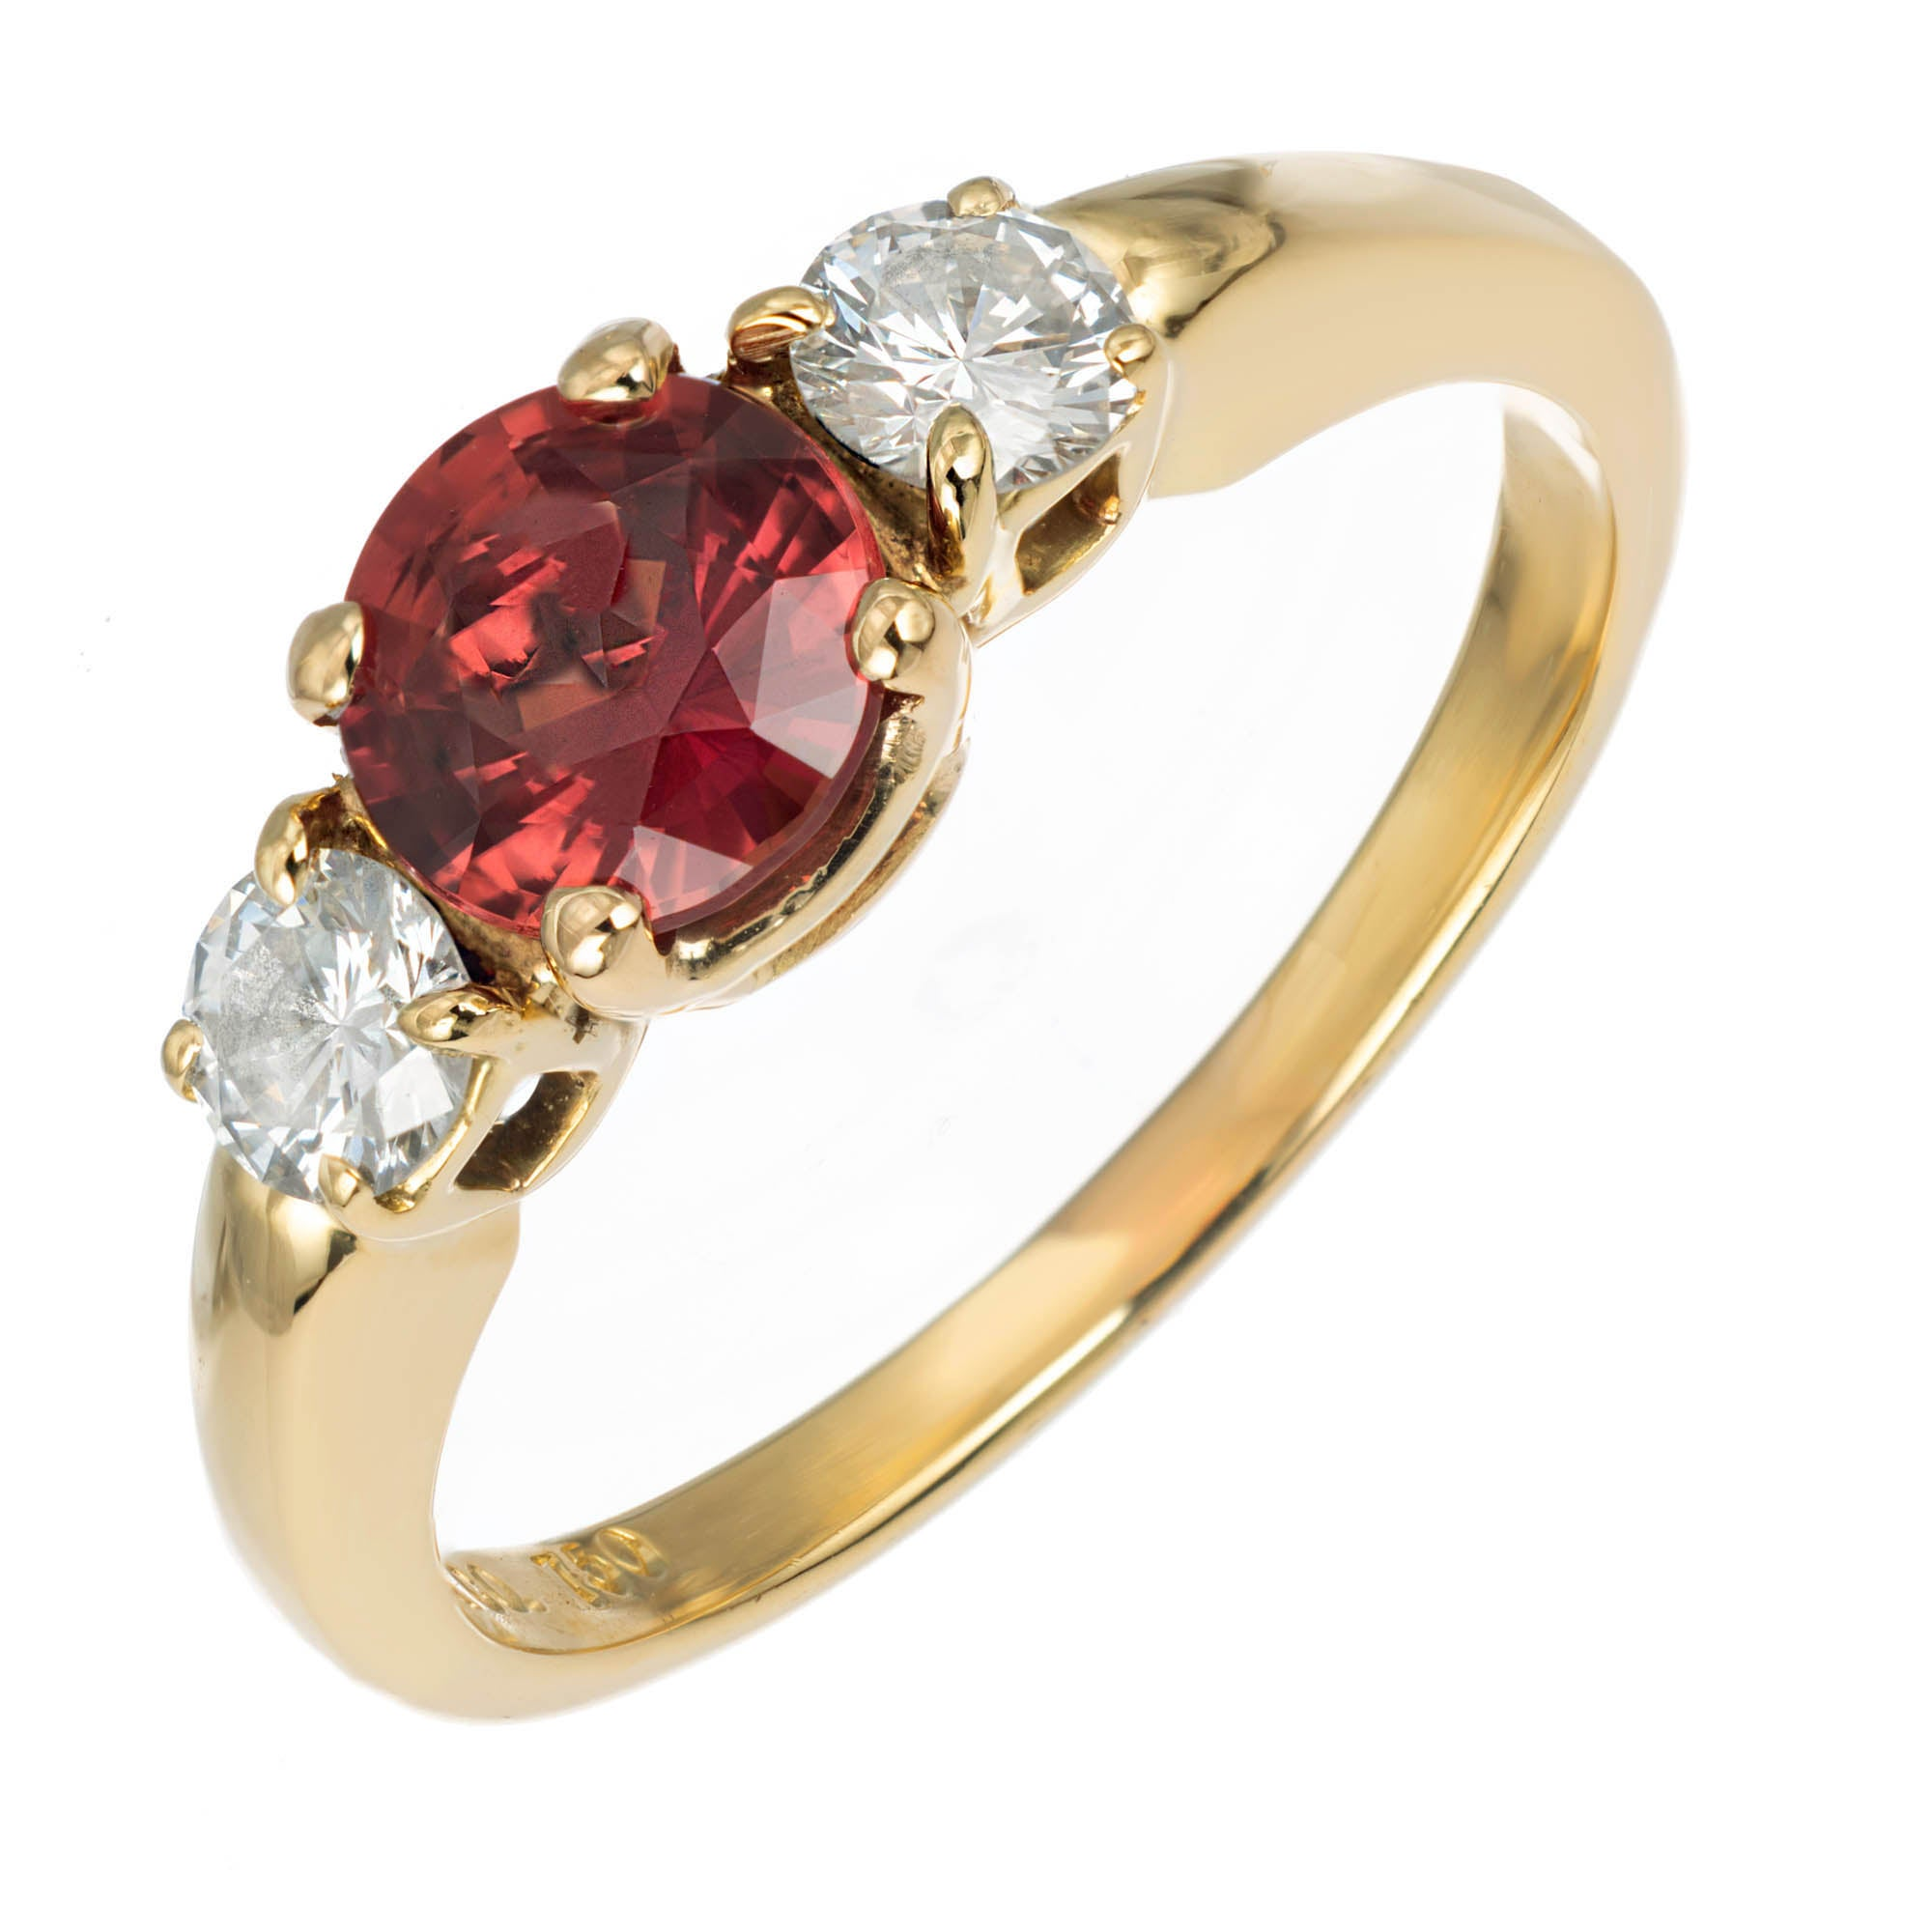 Tiffany & Co. Sapphire Diamond Gold Three-Stone Engagment Ring